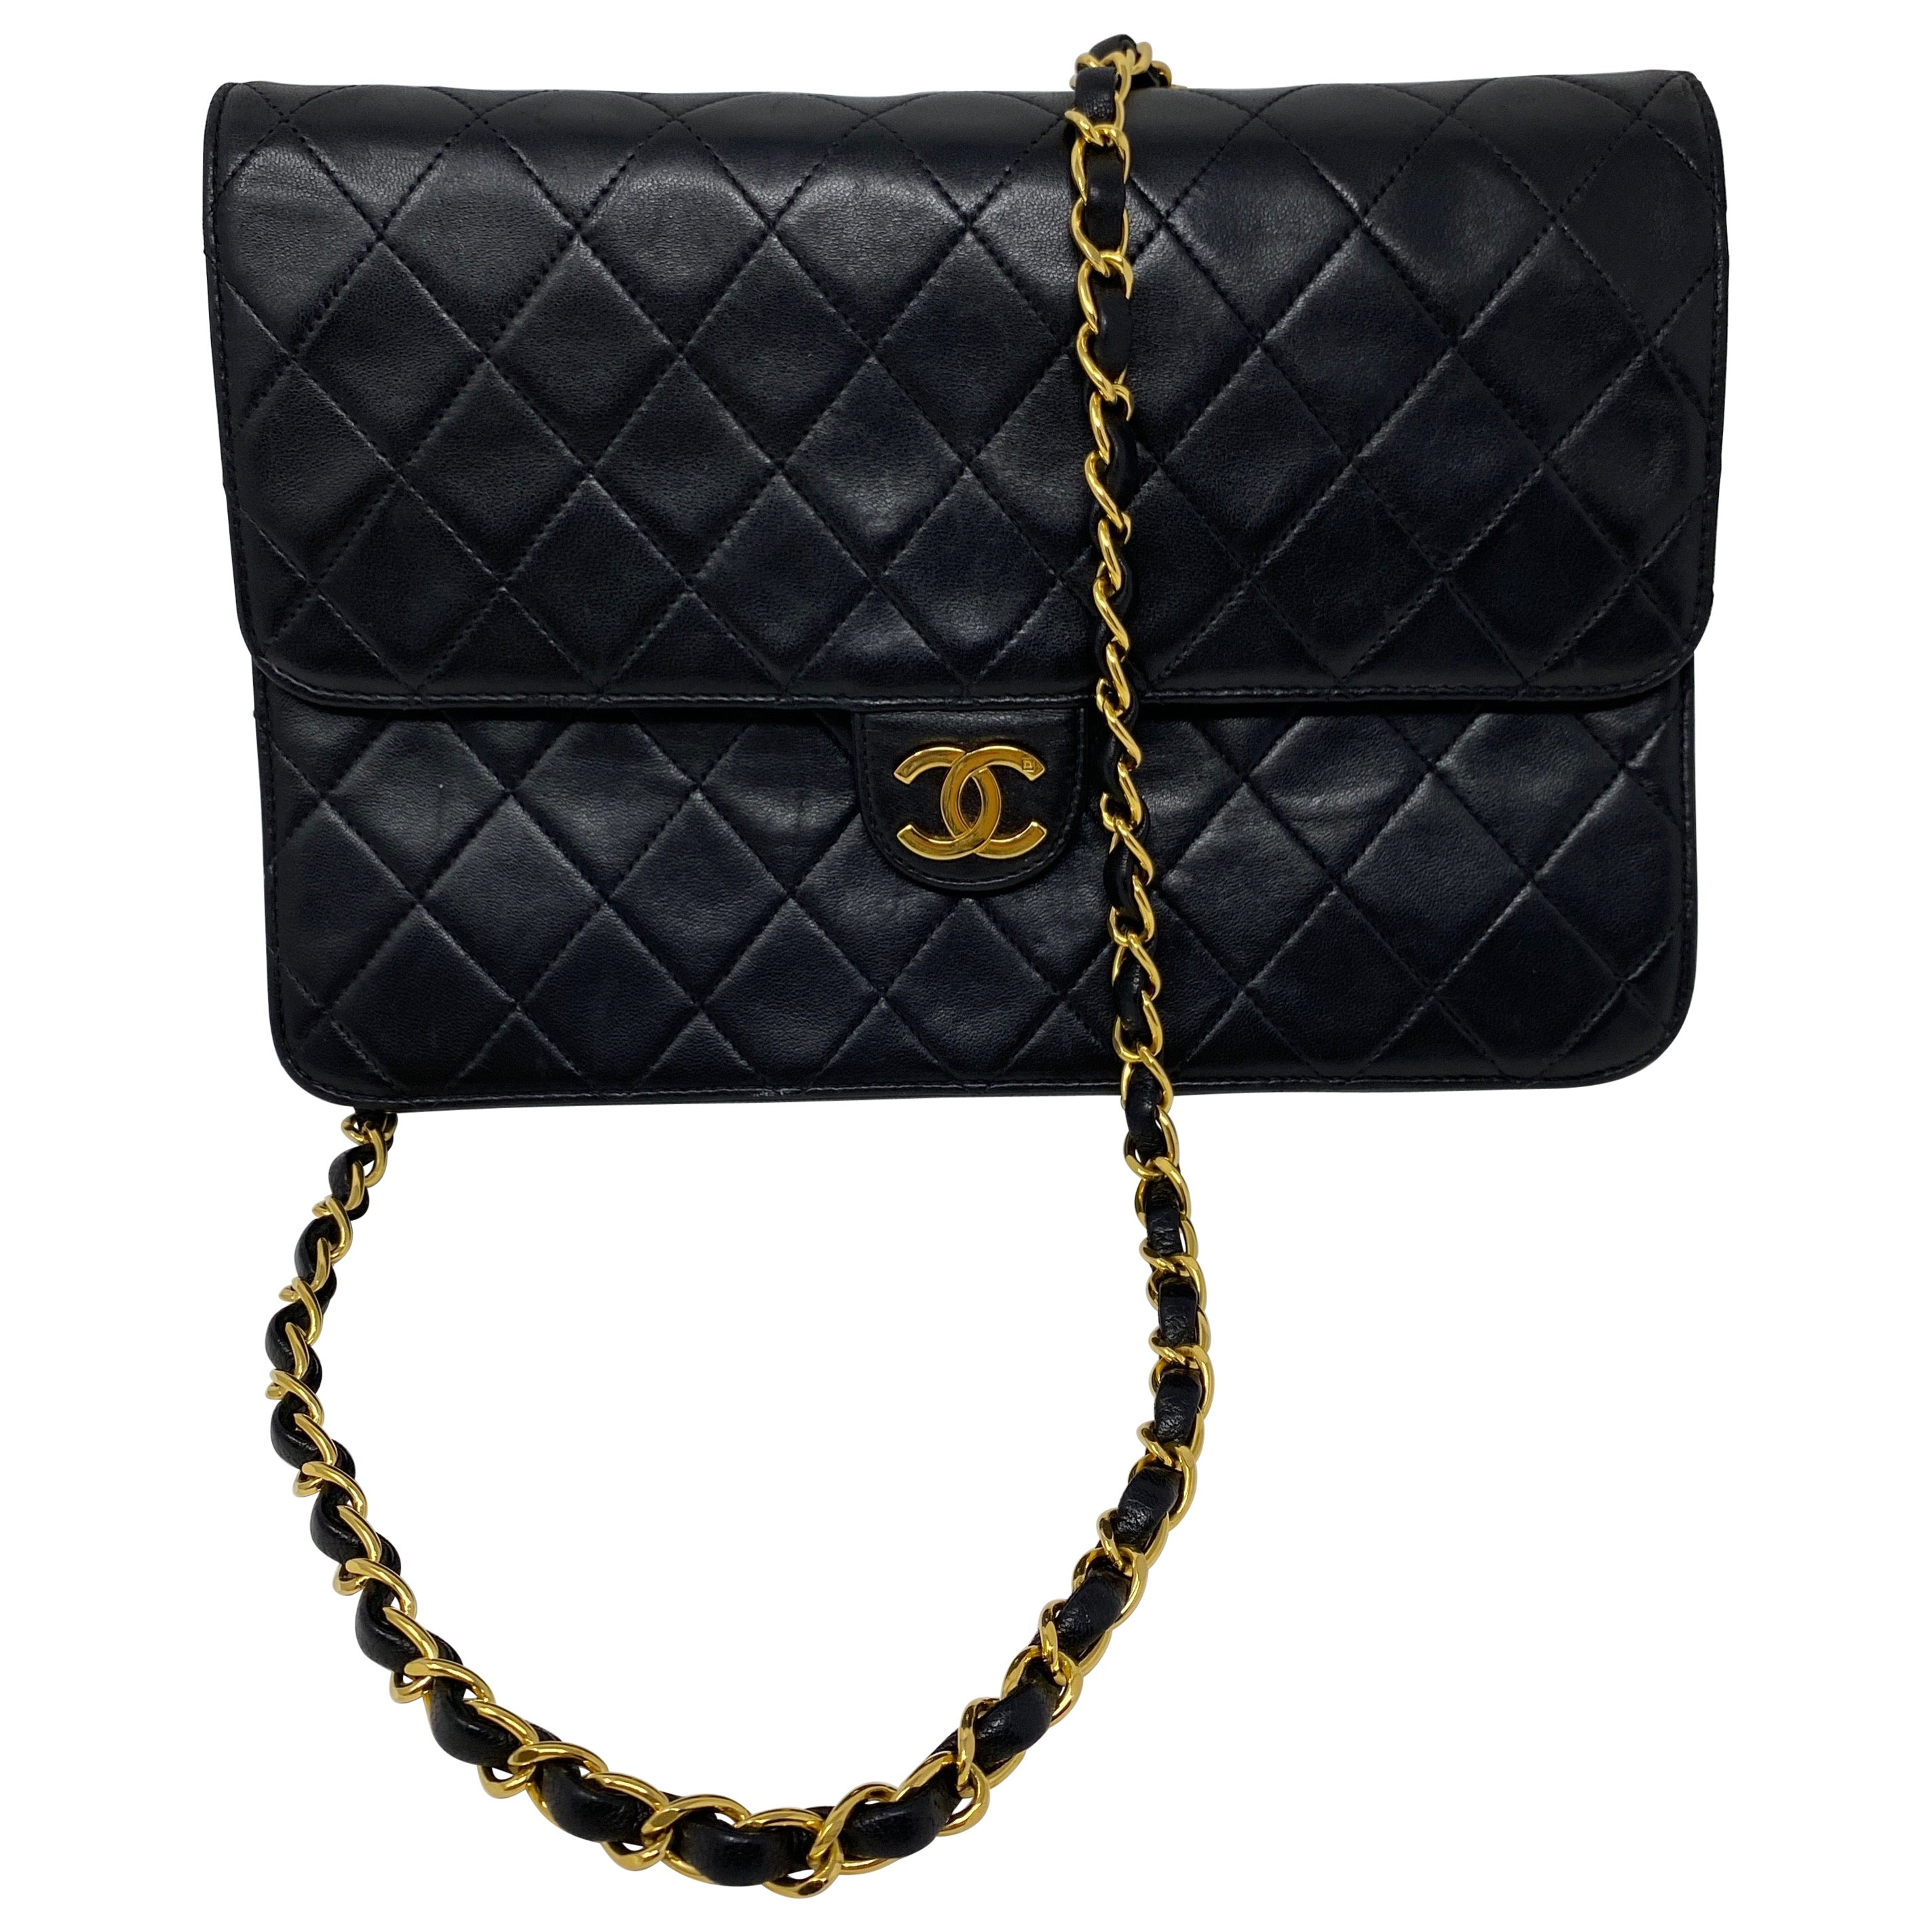 Chanel Black Clutch Bag Chain Strap